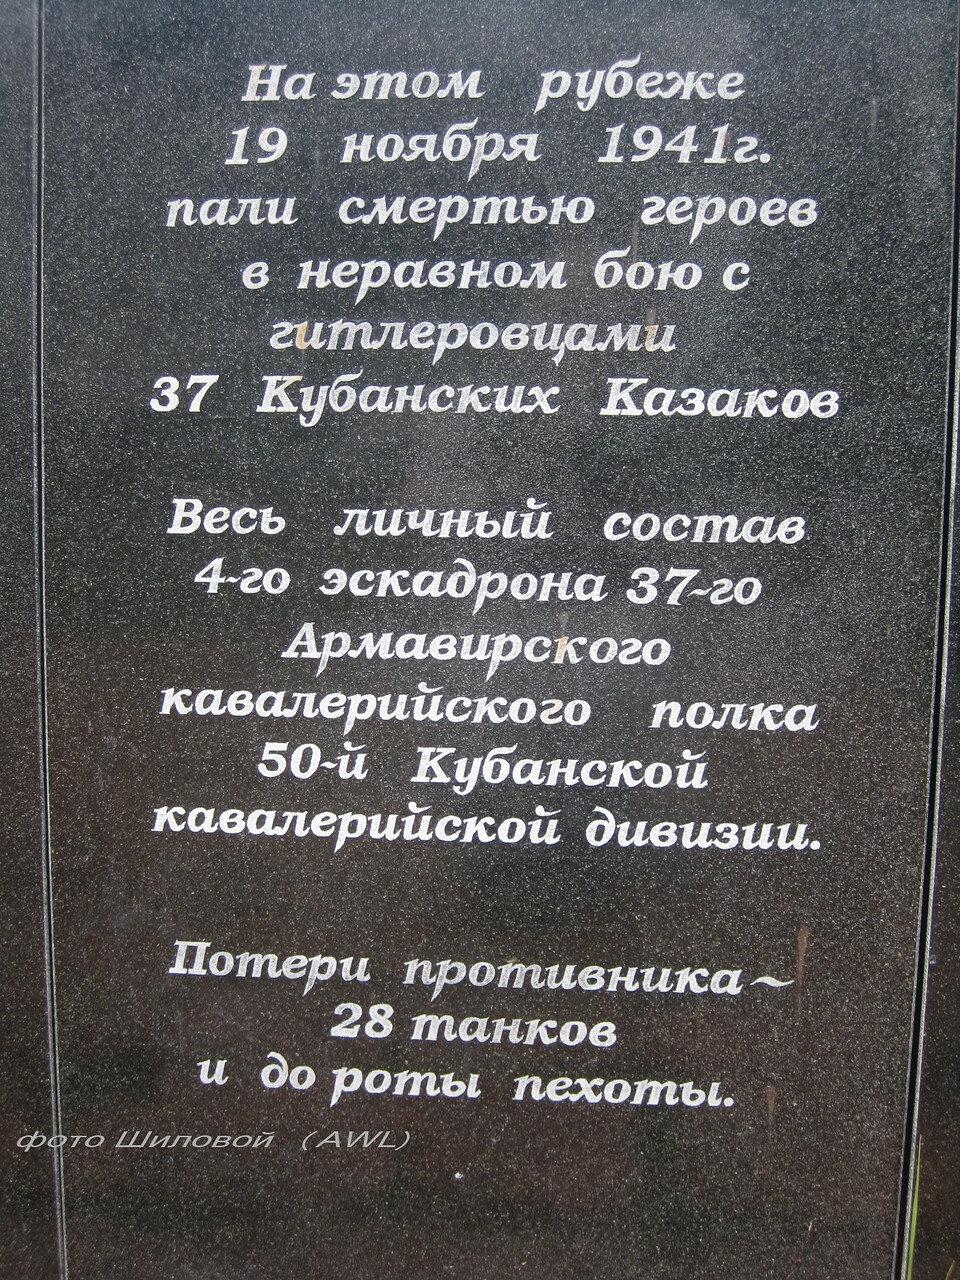 https://img-fotki.yandex.ru/get/113961/199368979.1c/0_1bdf4b_dad99506_XXXL.jpg